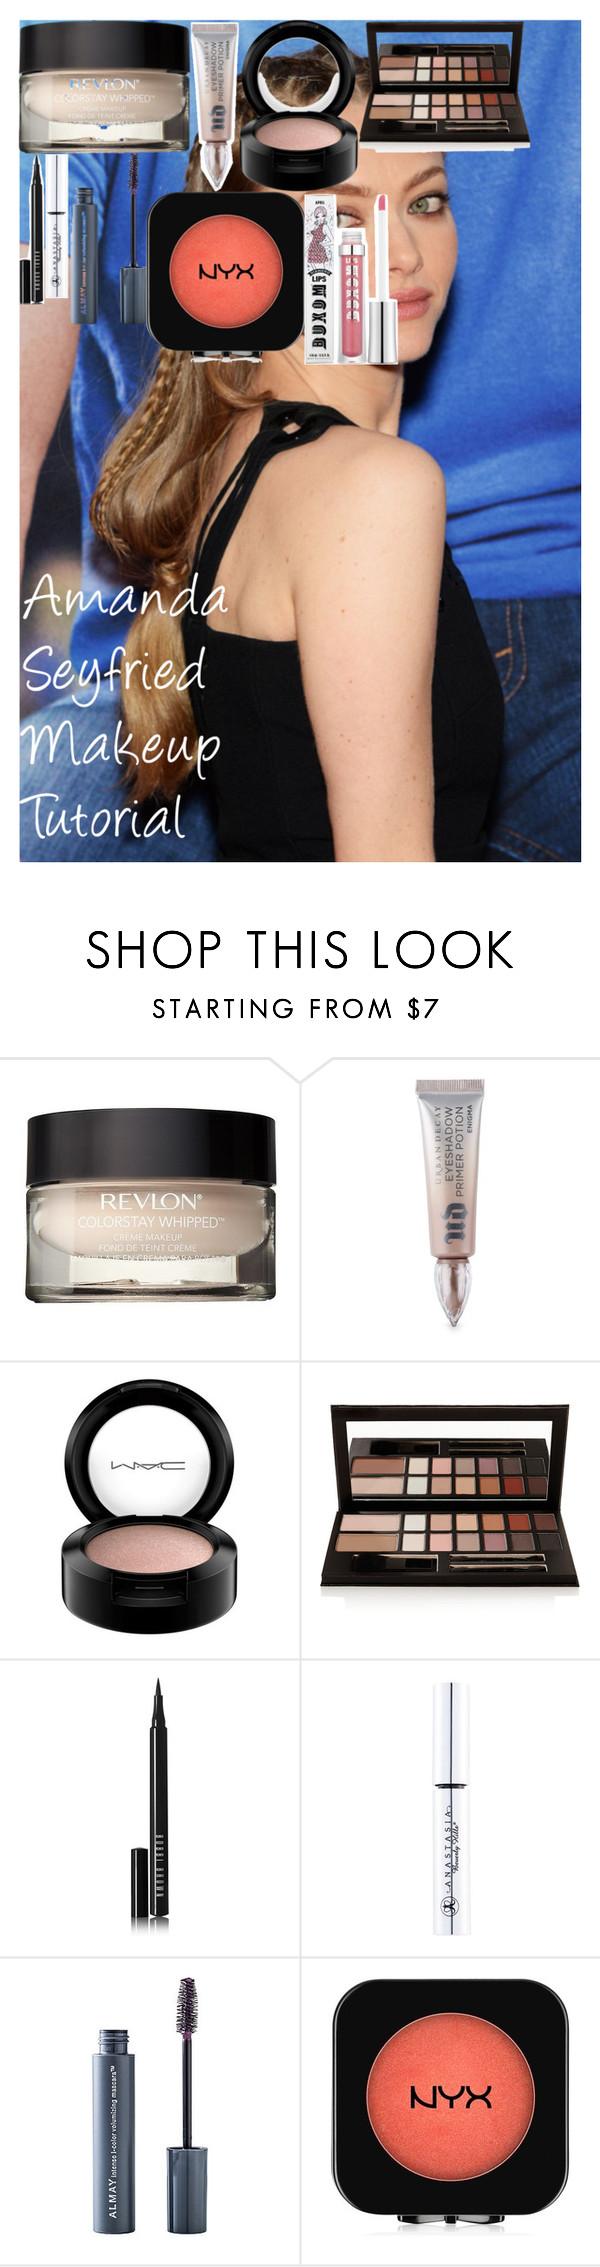 """Amanda Seyfried Makeup Tutorial"" by oroartye1 on"